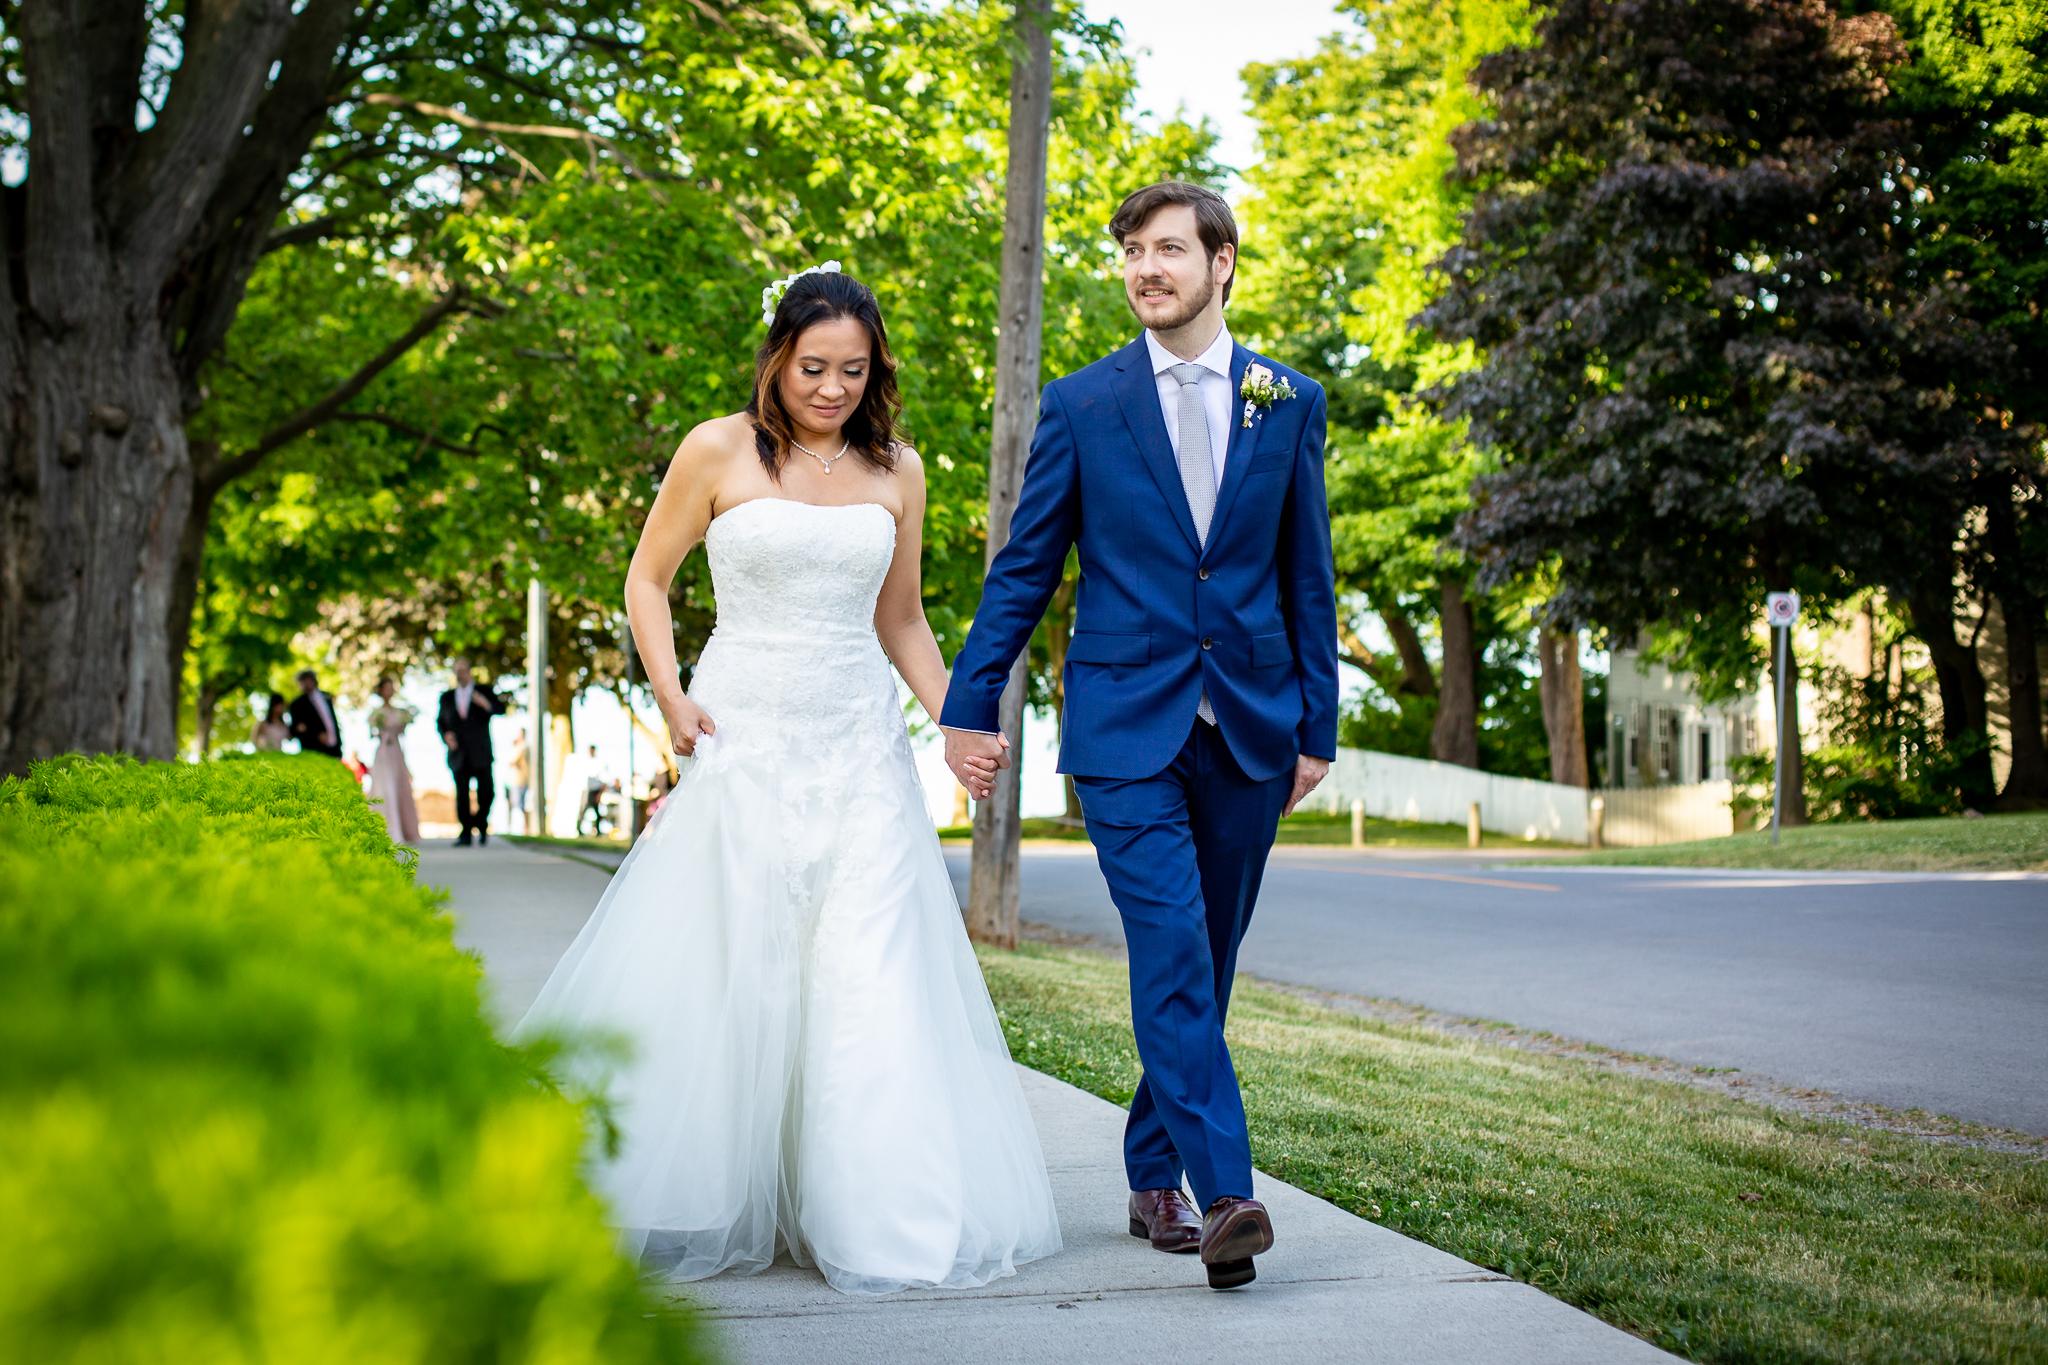 Toronto-wedding-Photograper-45.jpg